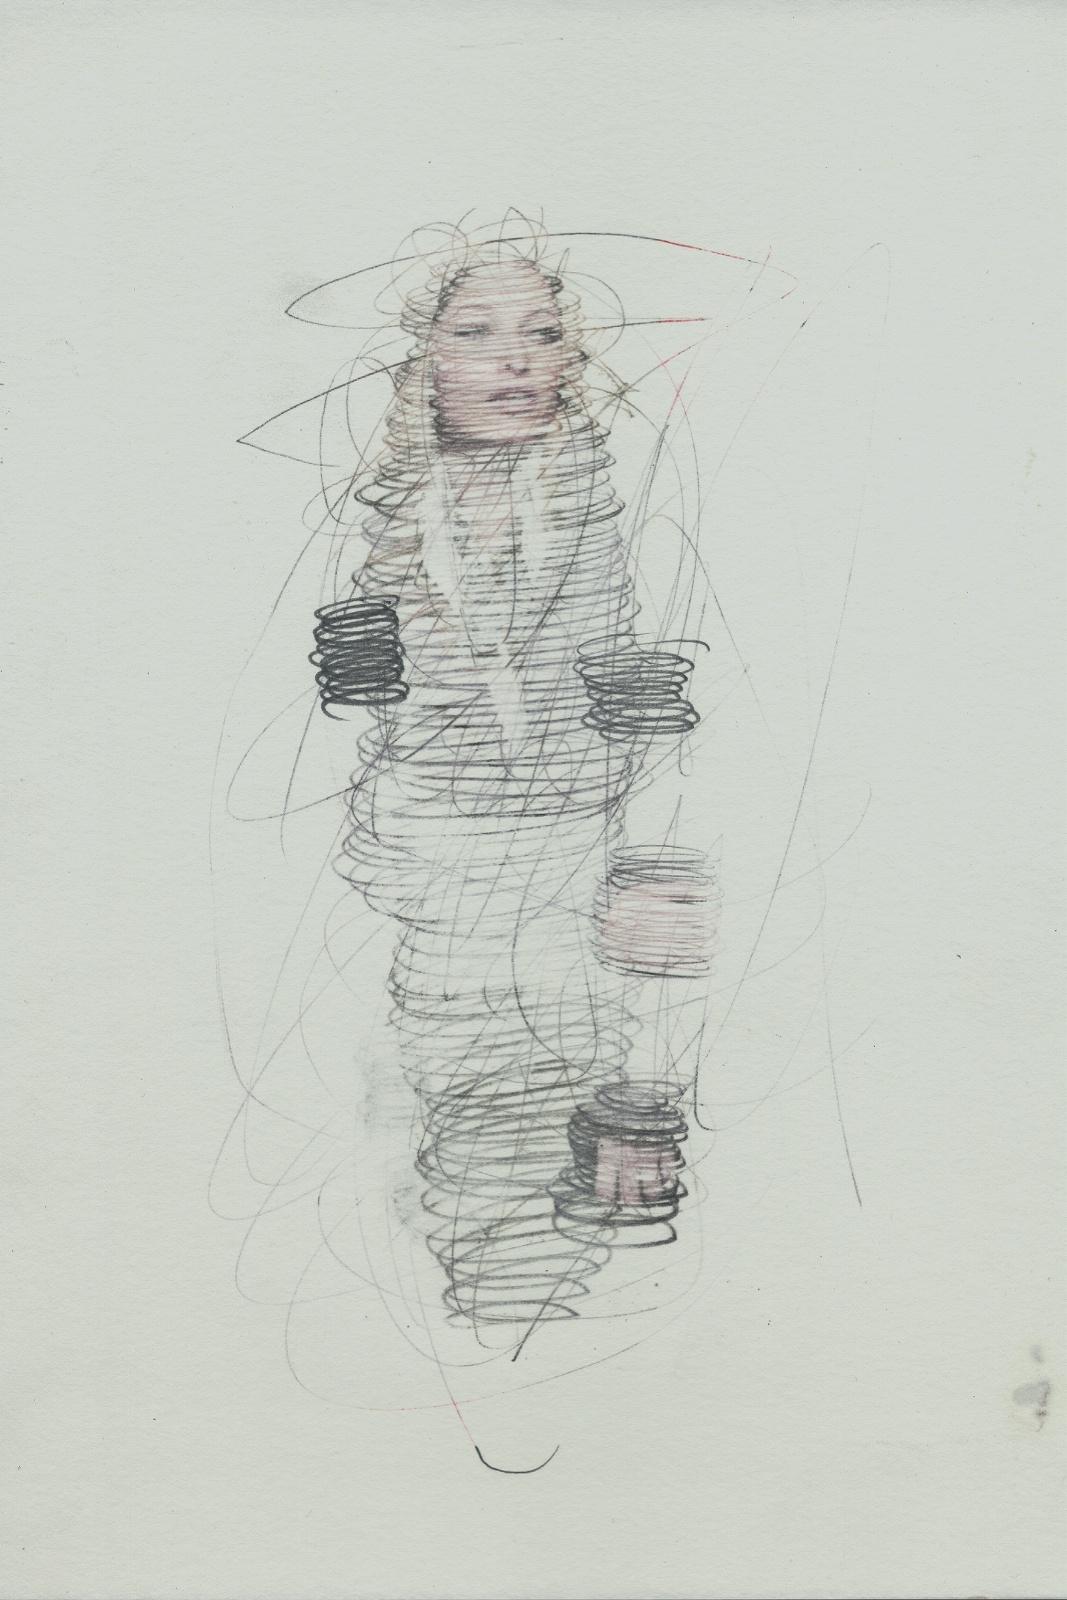 Spin #04, 2014, Lavender-Oil transferprint, pencil, 21 x 28 cm